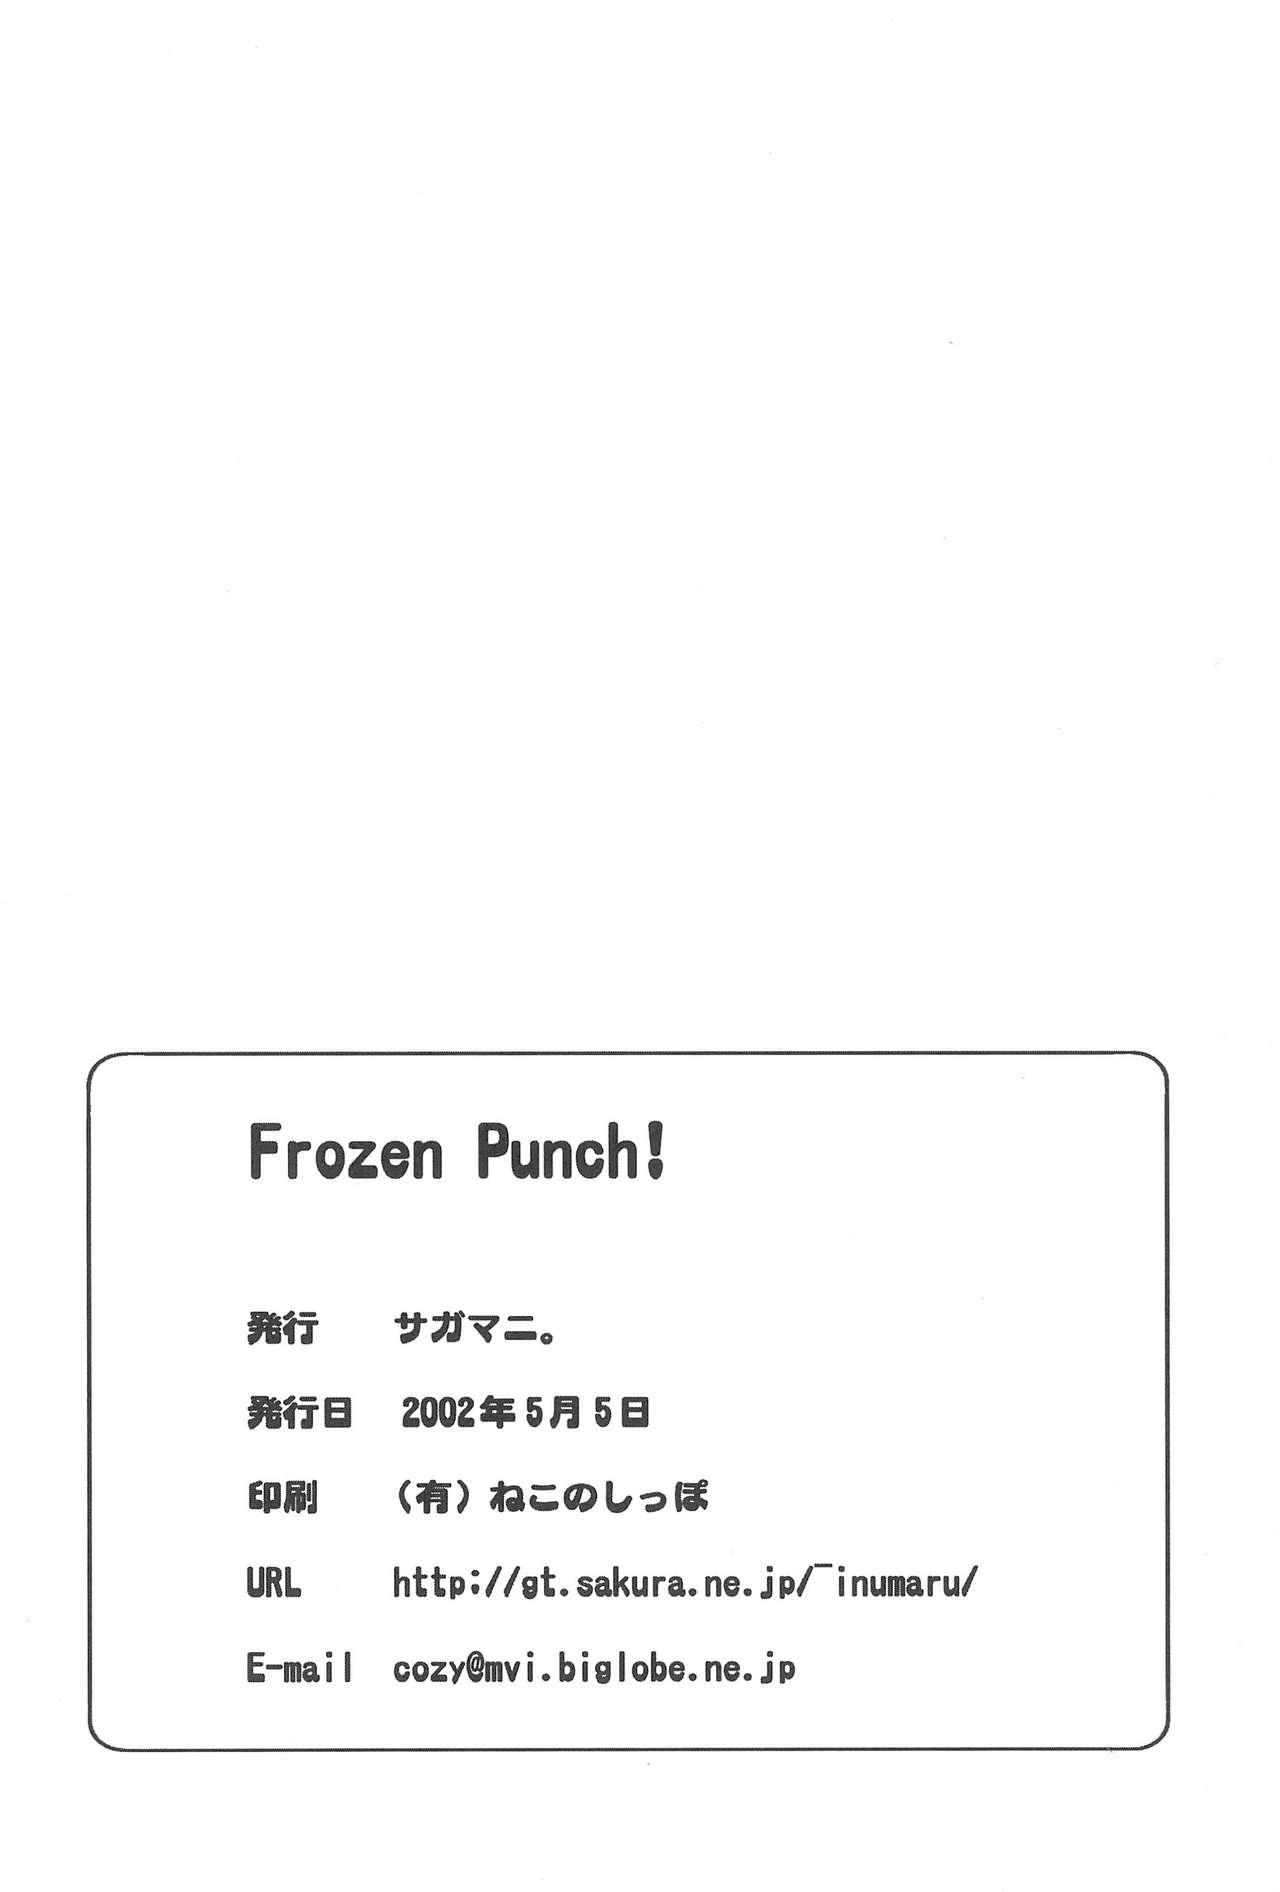 Frozen Punch! 29